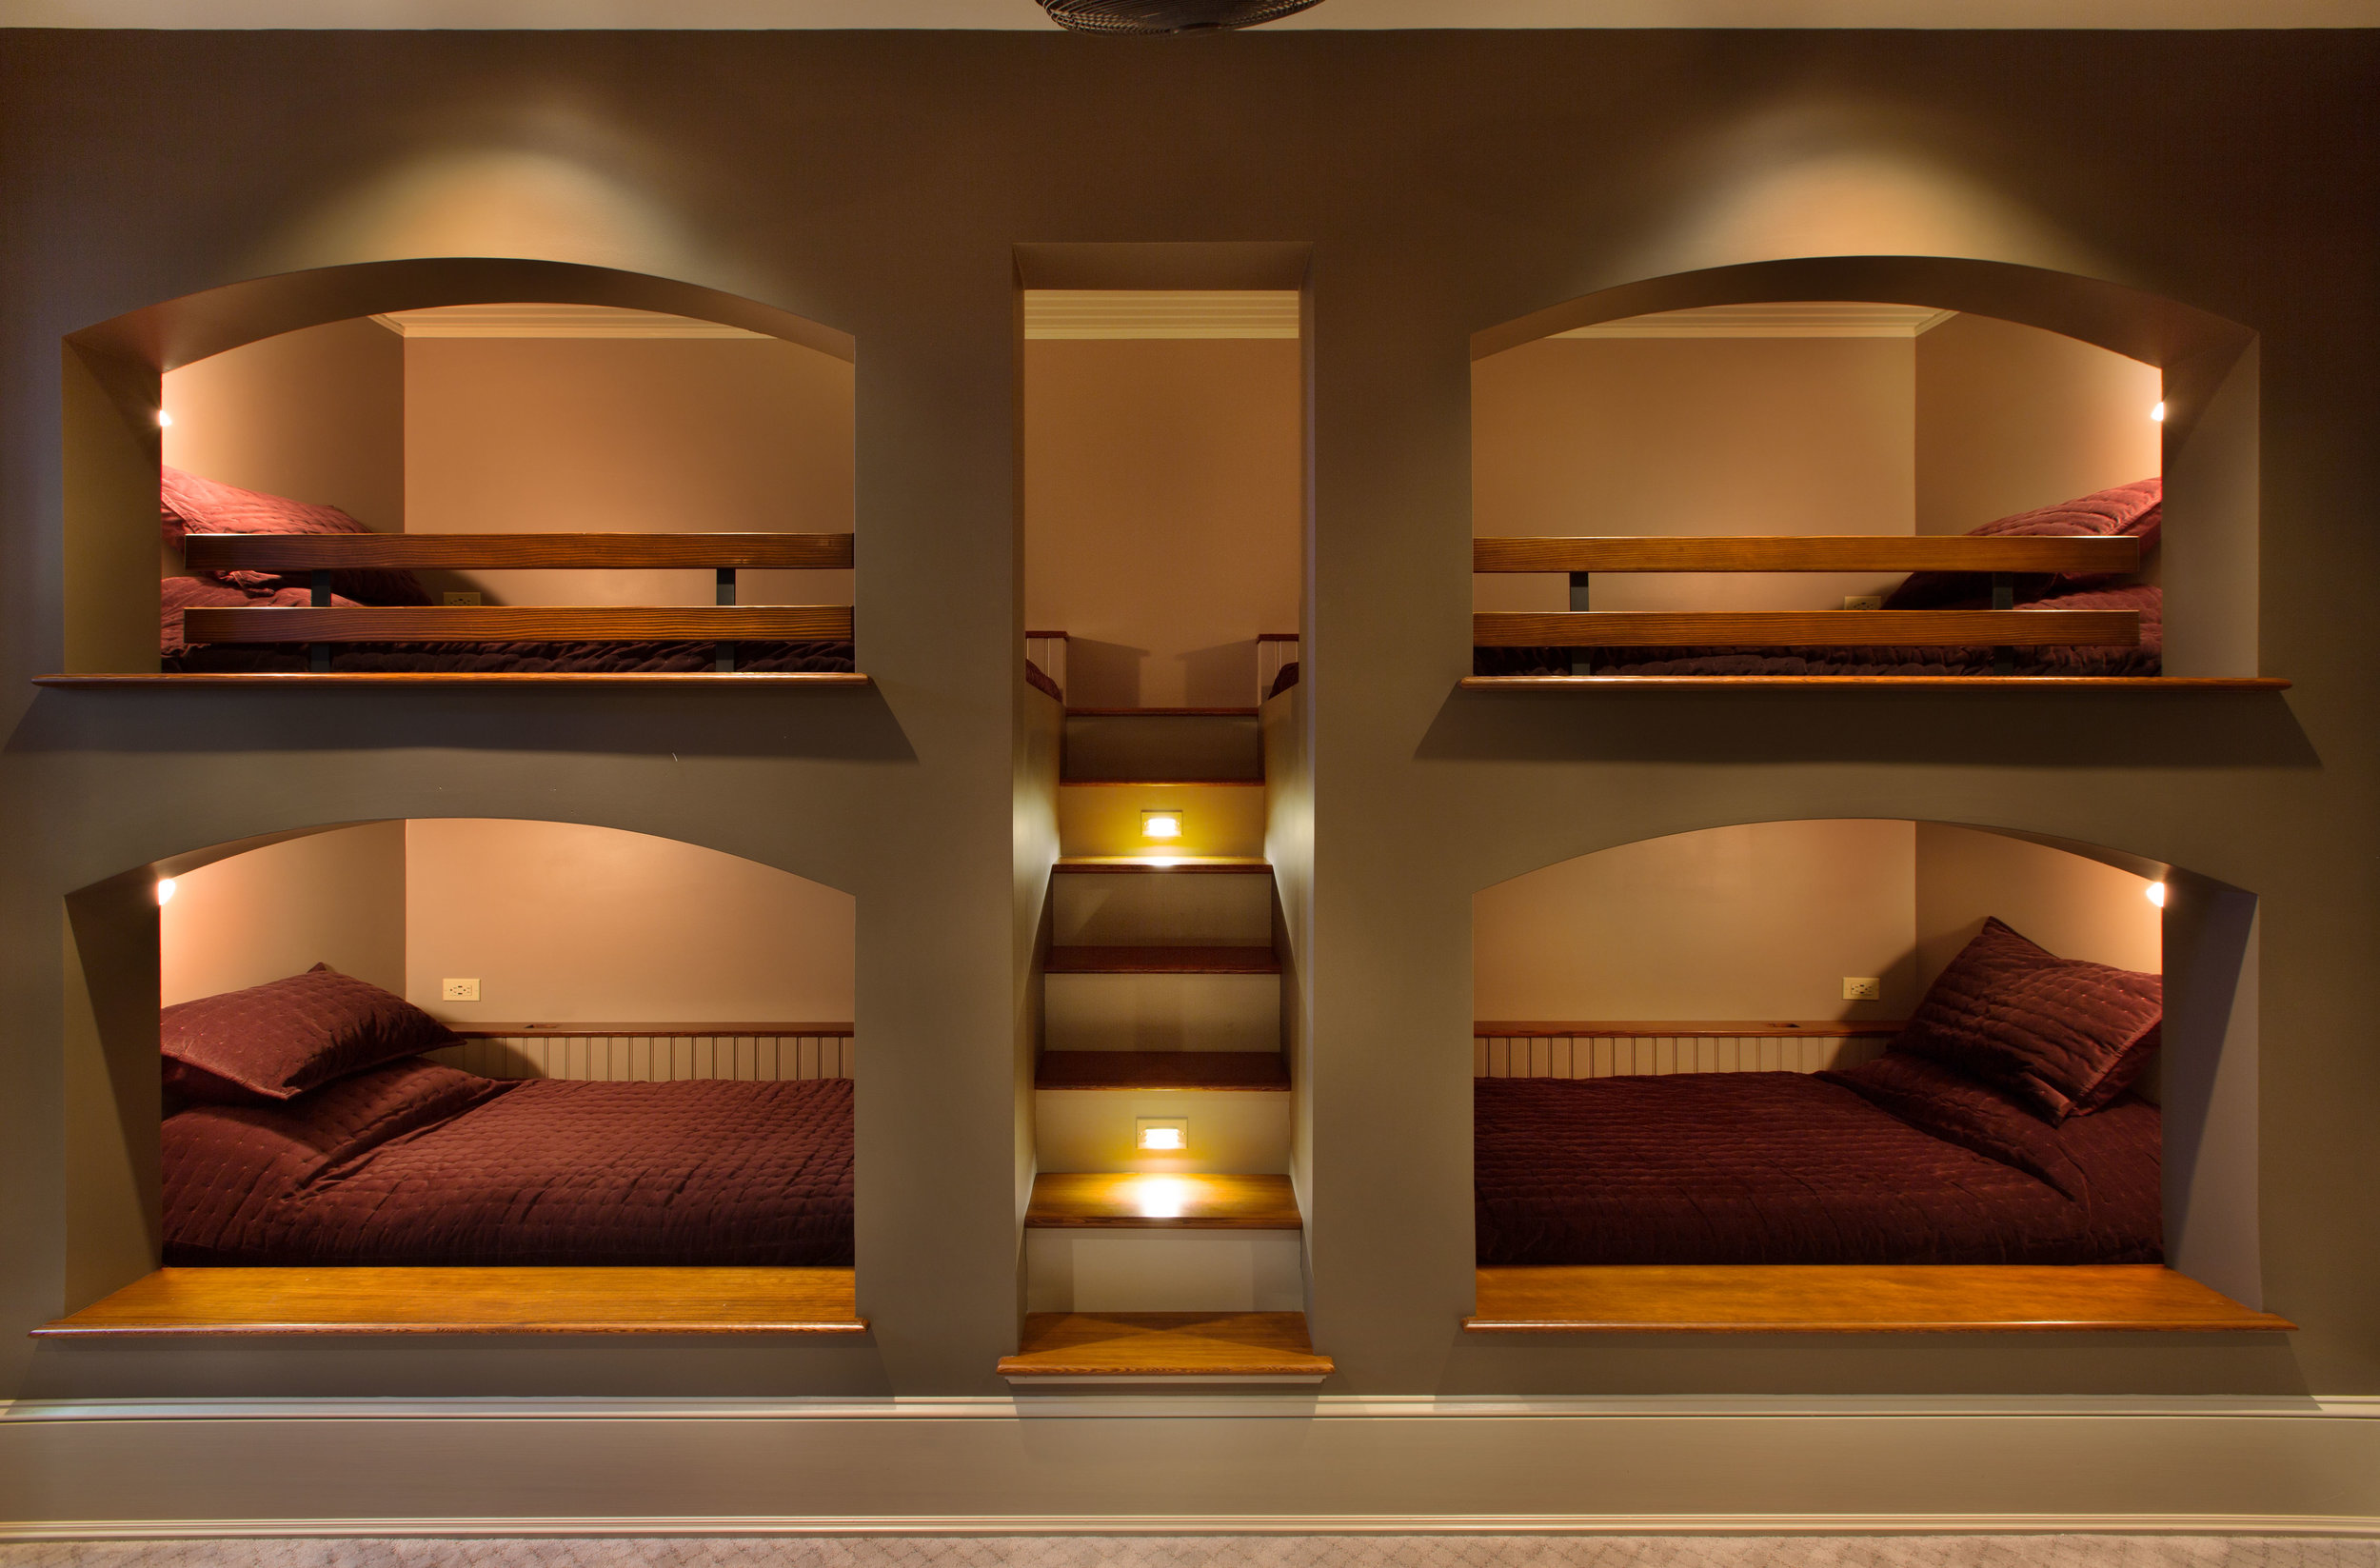 Corcoran-Bunk Room 3.jpg